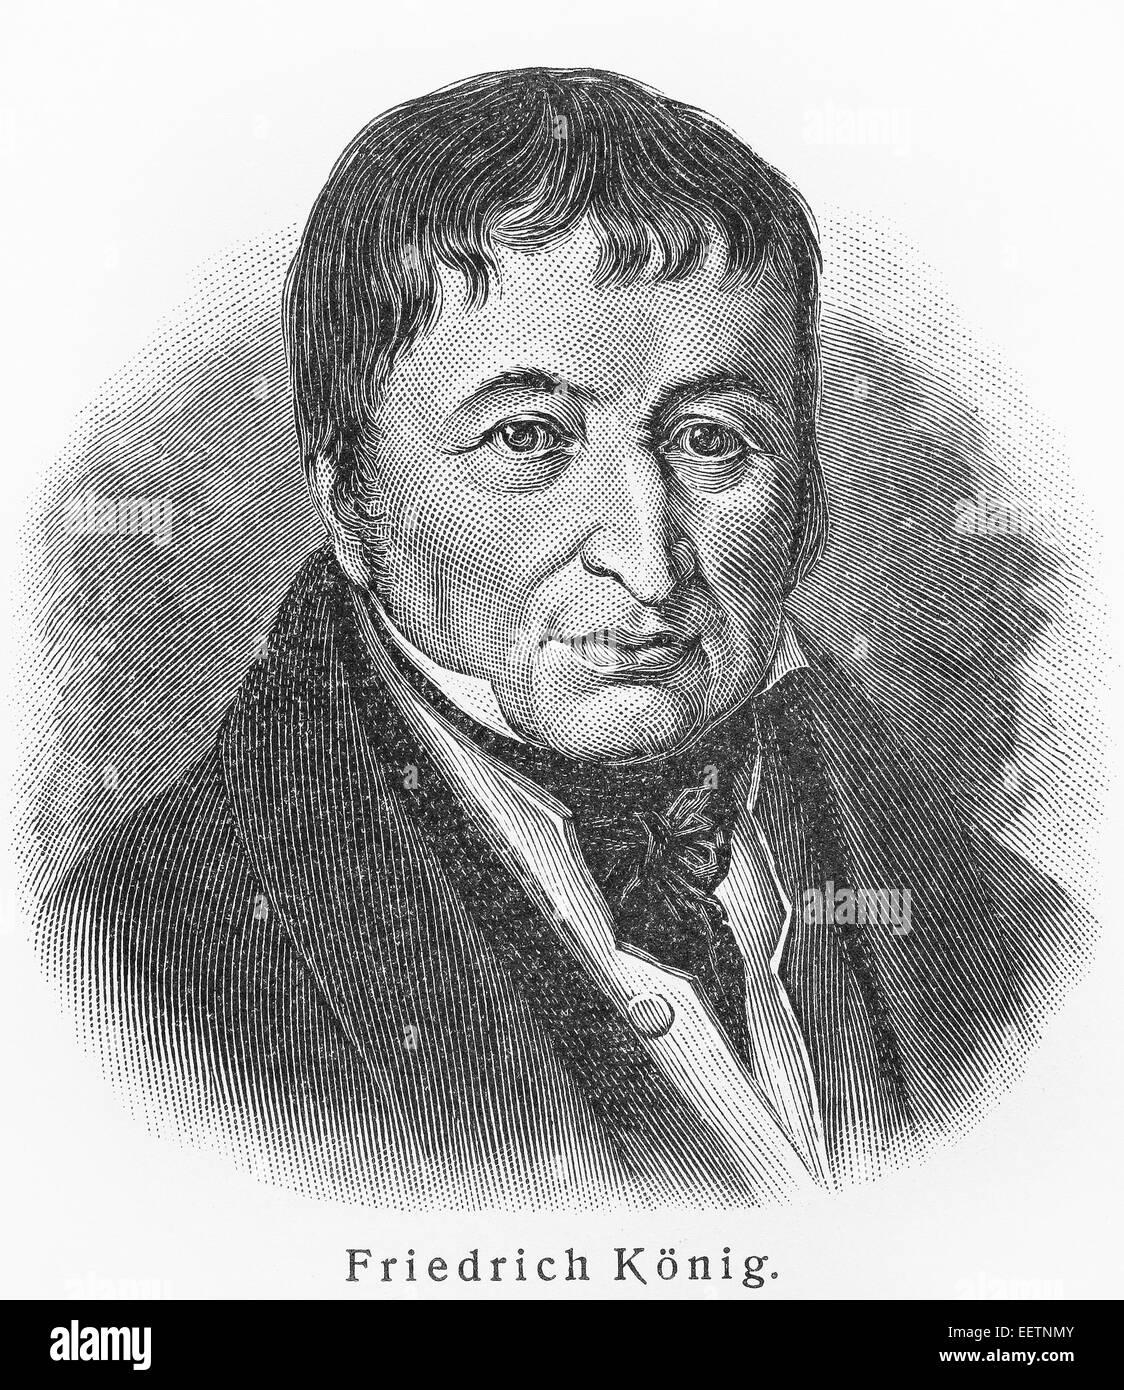 Friedrich Koenig - Stock Image